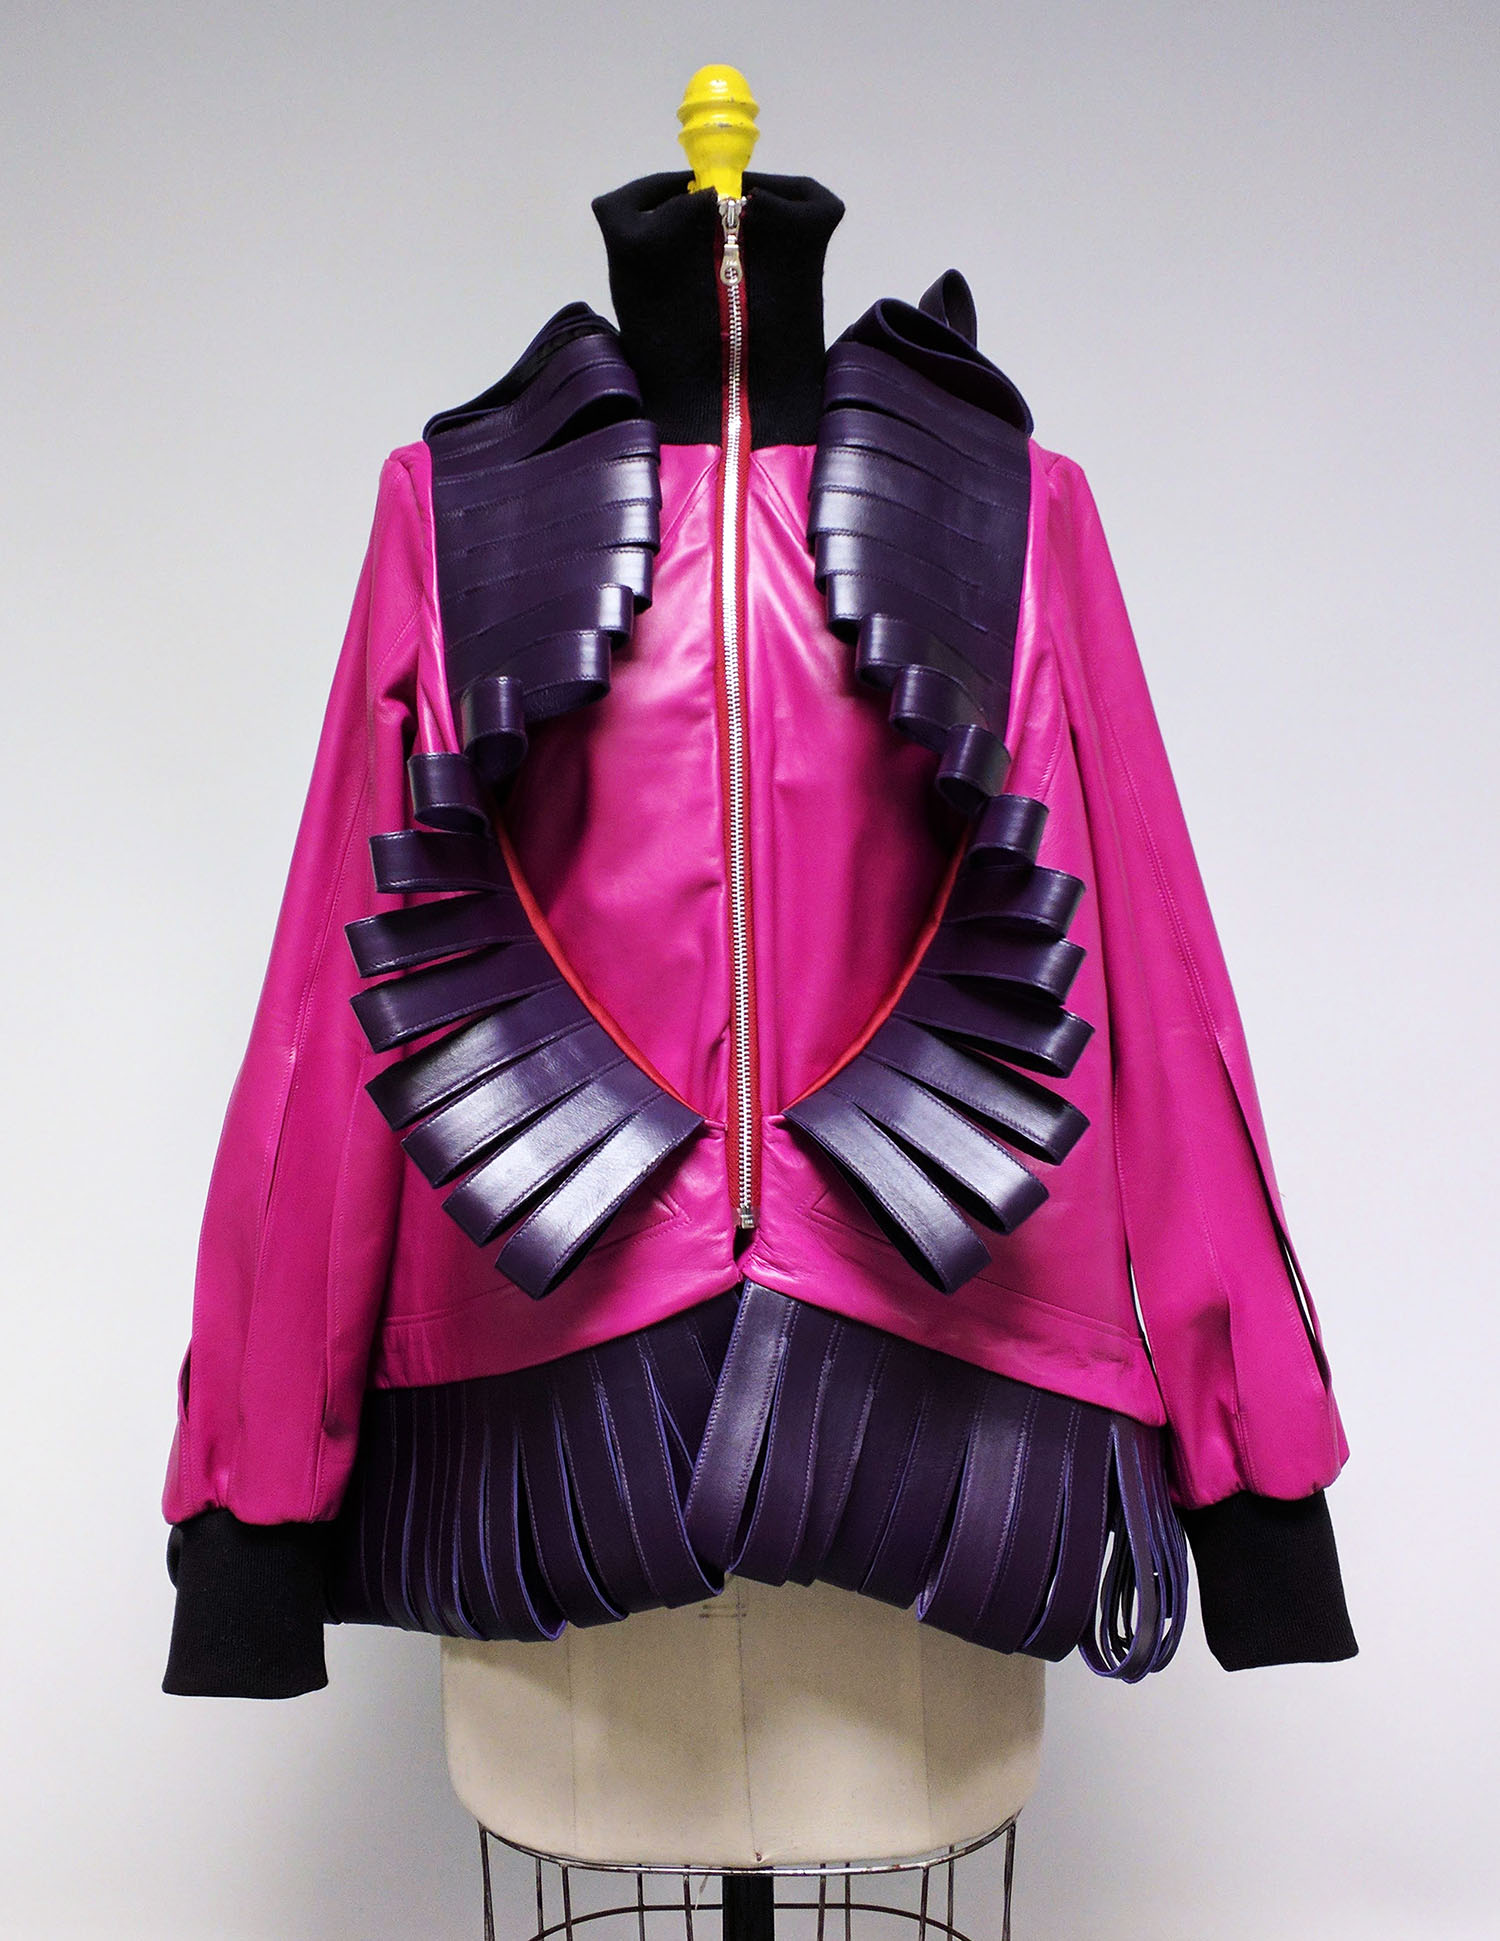 Leatherjacketfront-Web.jpg